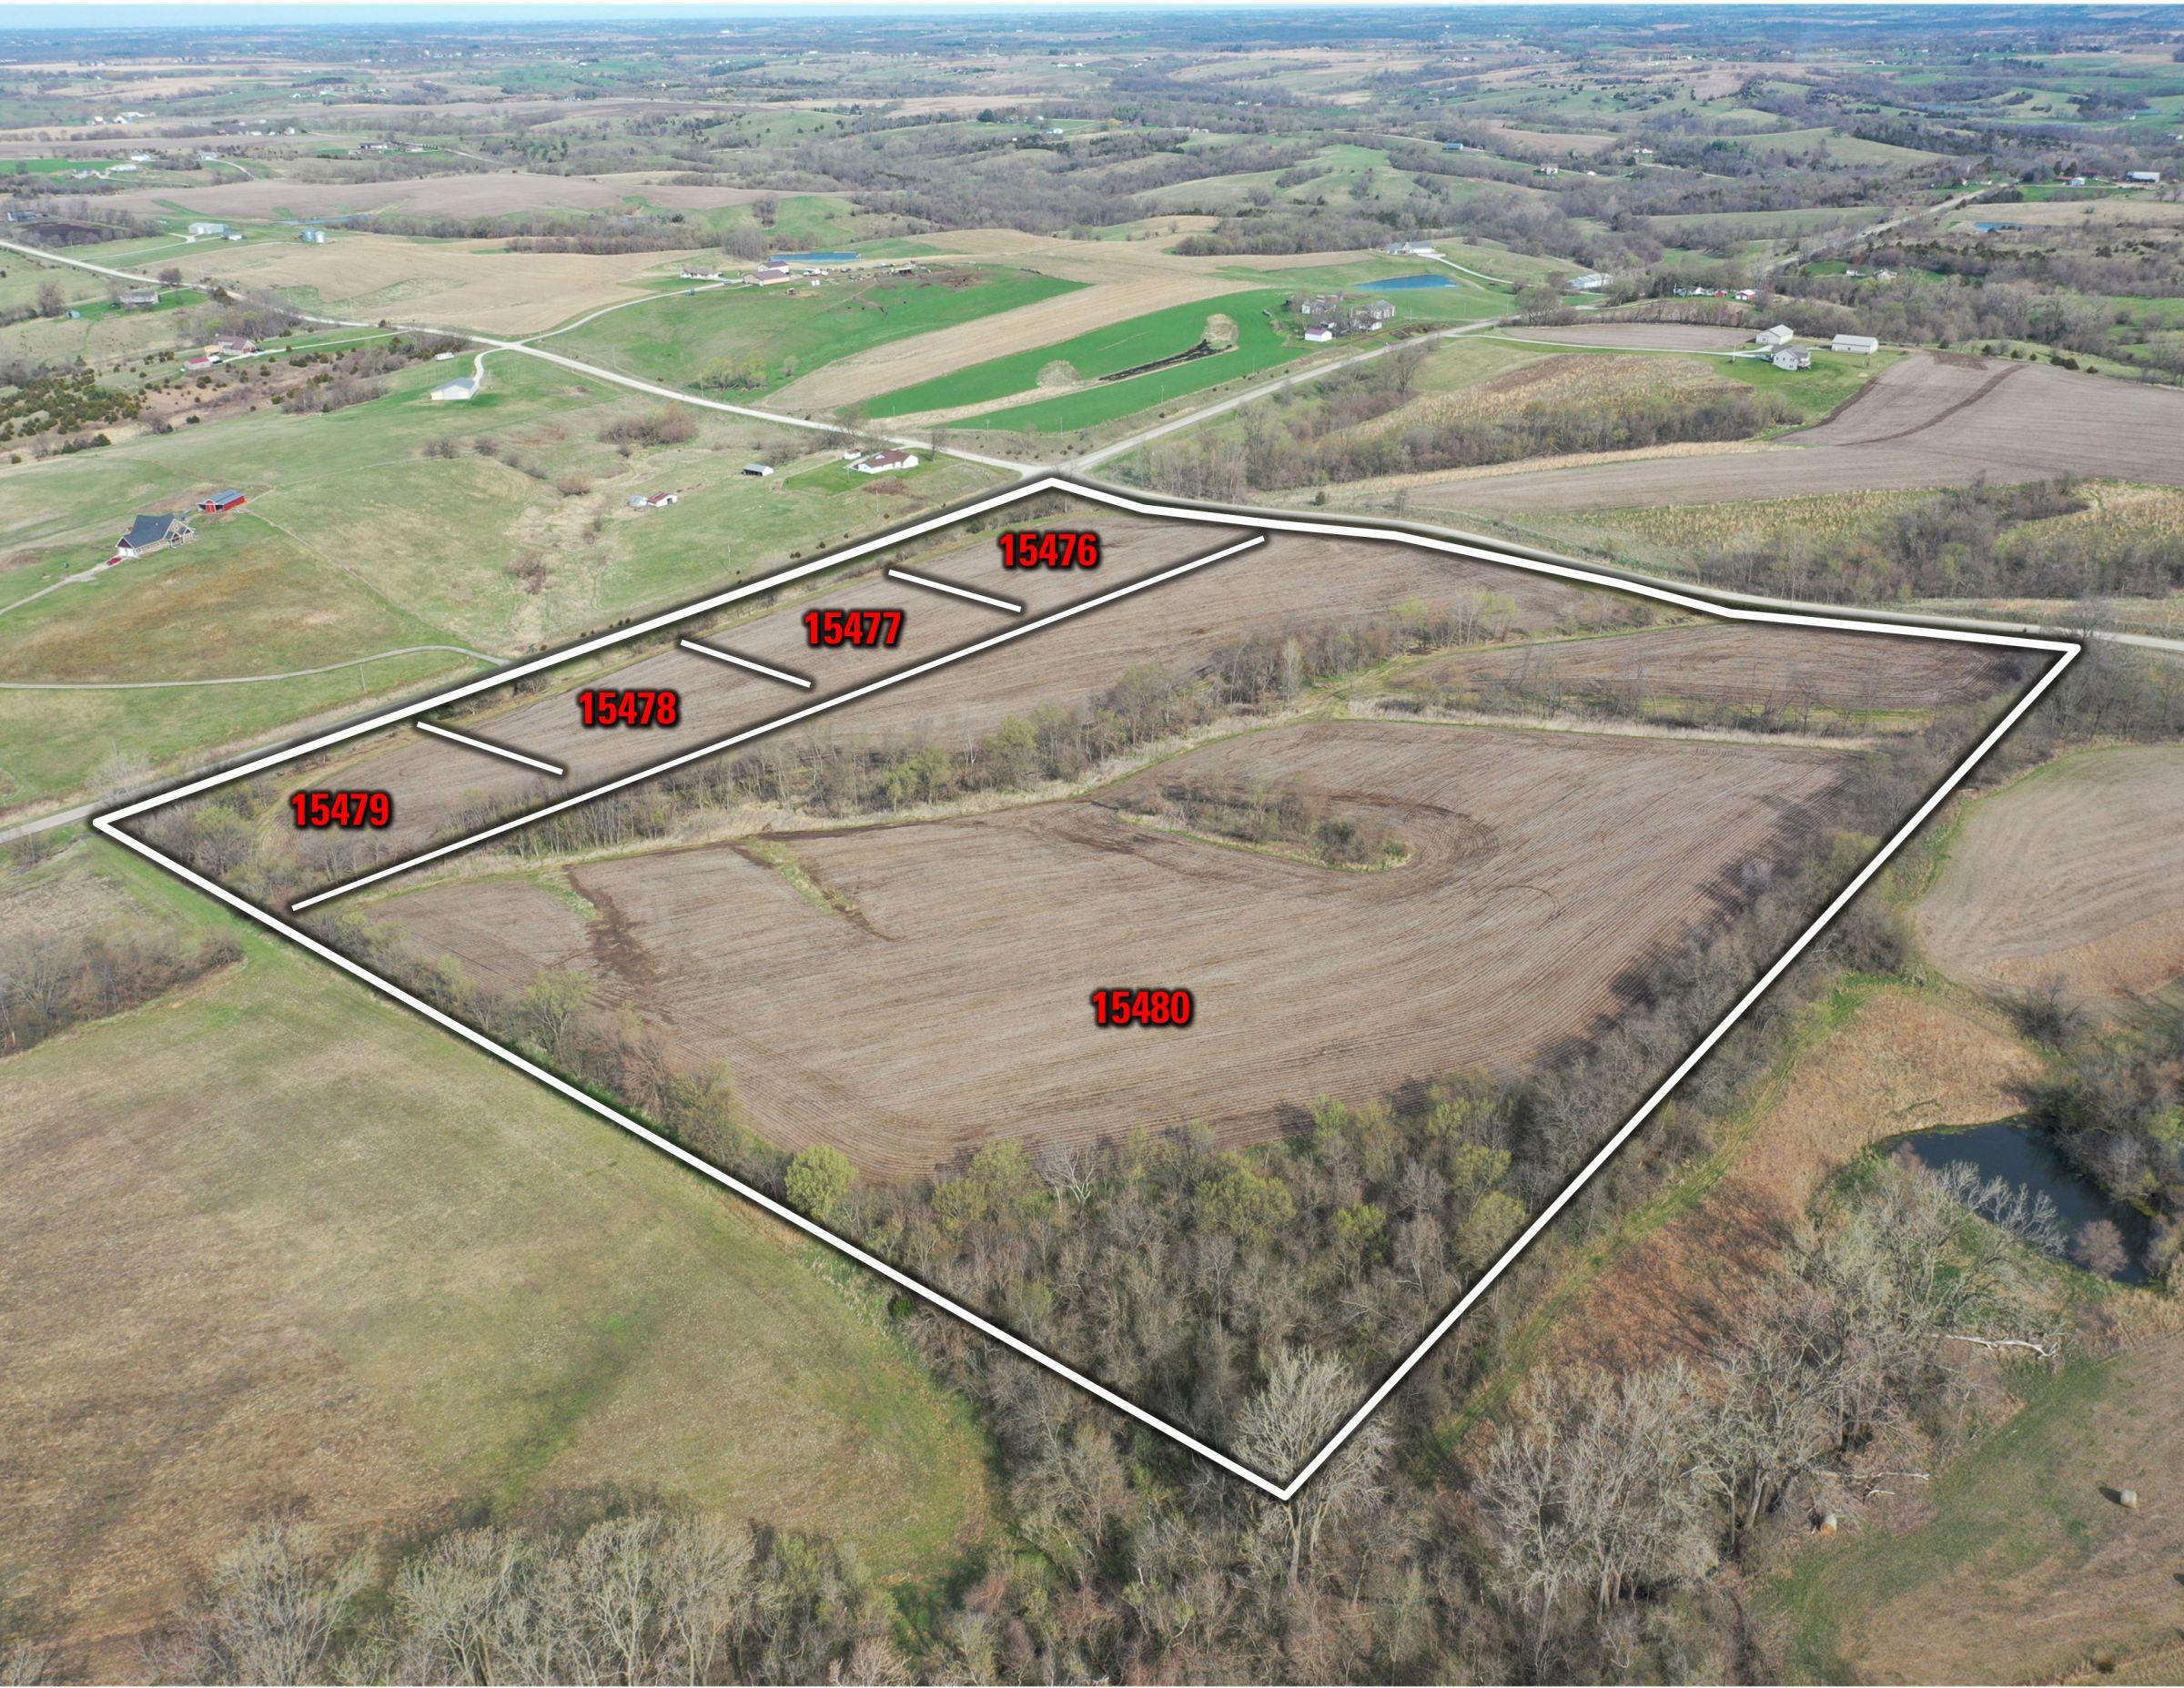 land-warren-county-iowa-3-acres-listing-number-15479-4-2021-04-21-185817.jpg